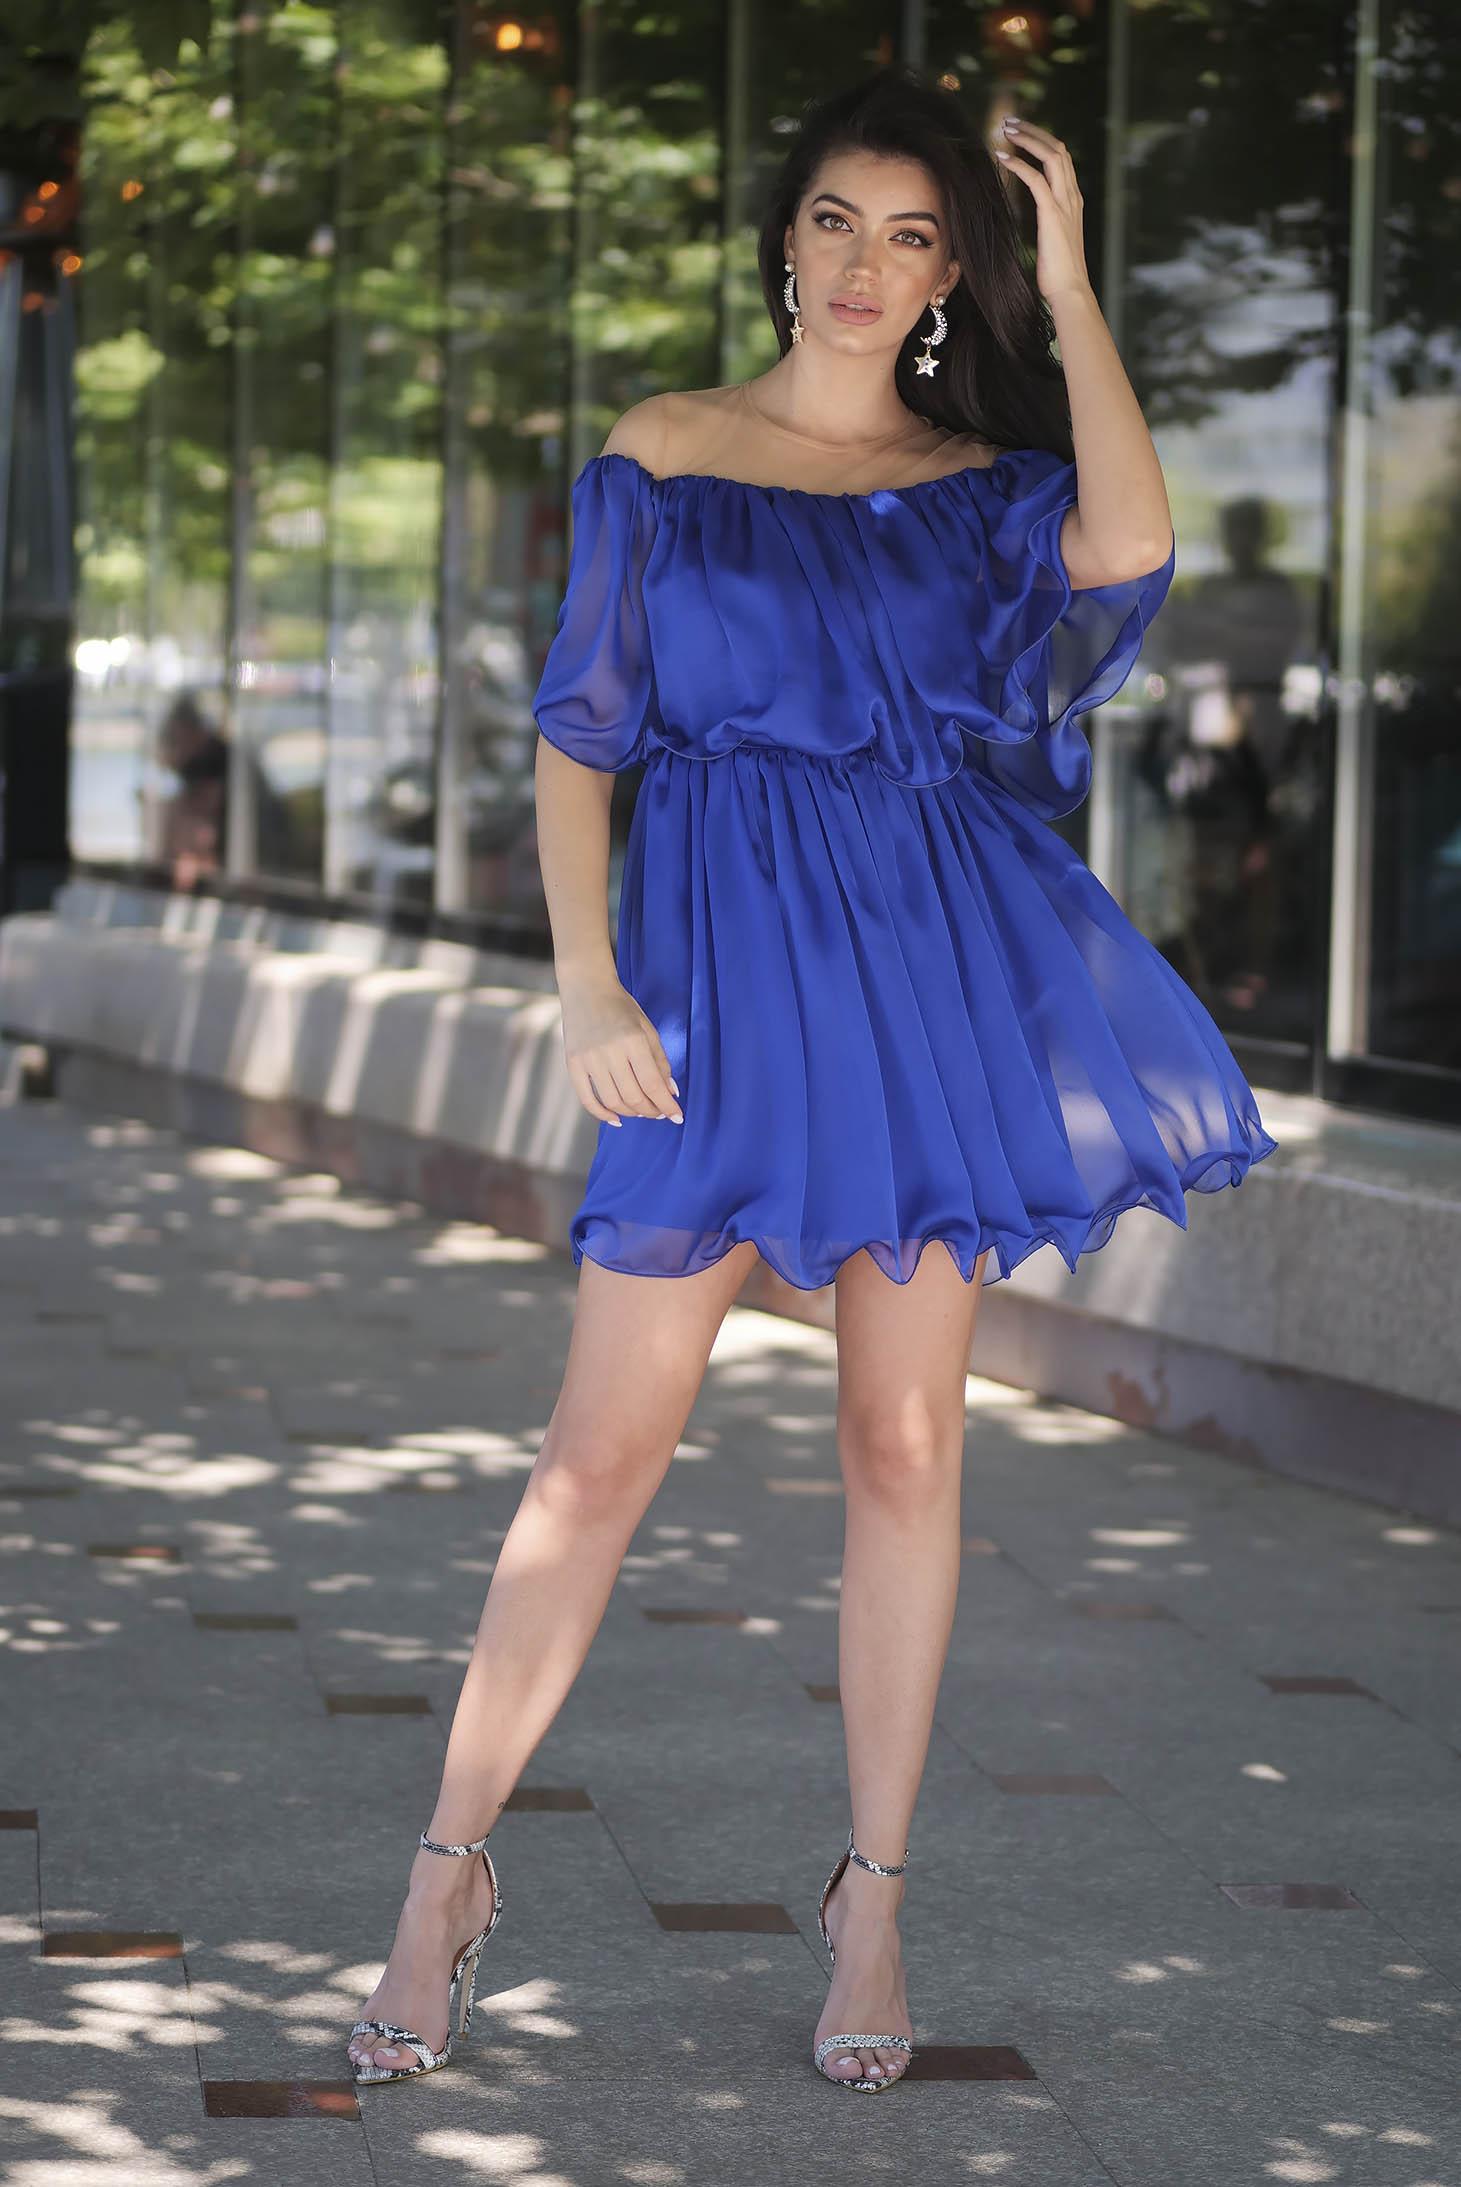 Rochie Artista albastra scurta de ocazie in clos din material subtire cu umeri goi